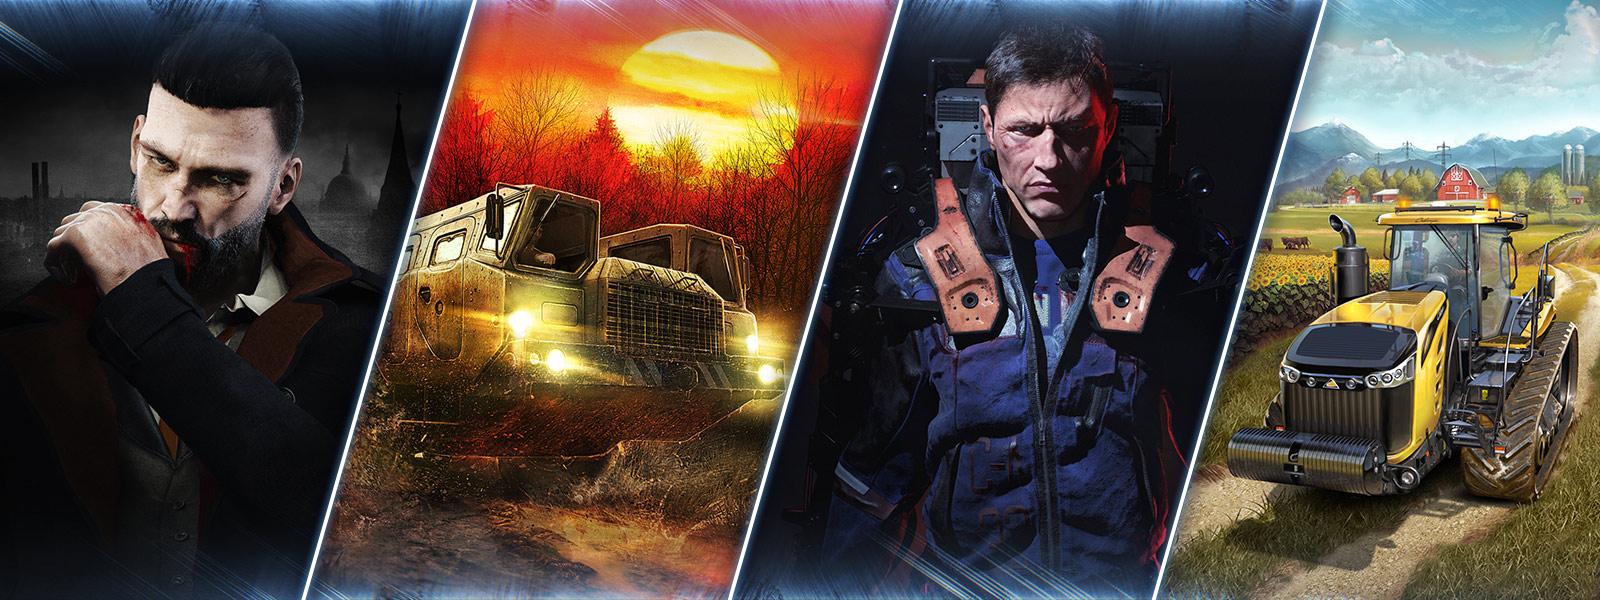 Vampyr, Mudrunners, The Surge and Farming Simulator graphics